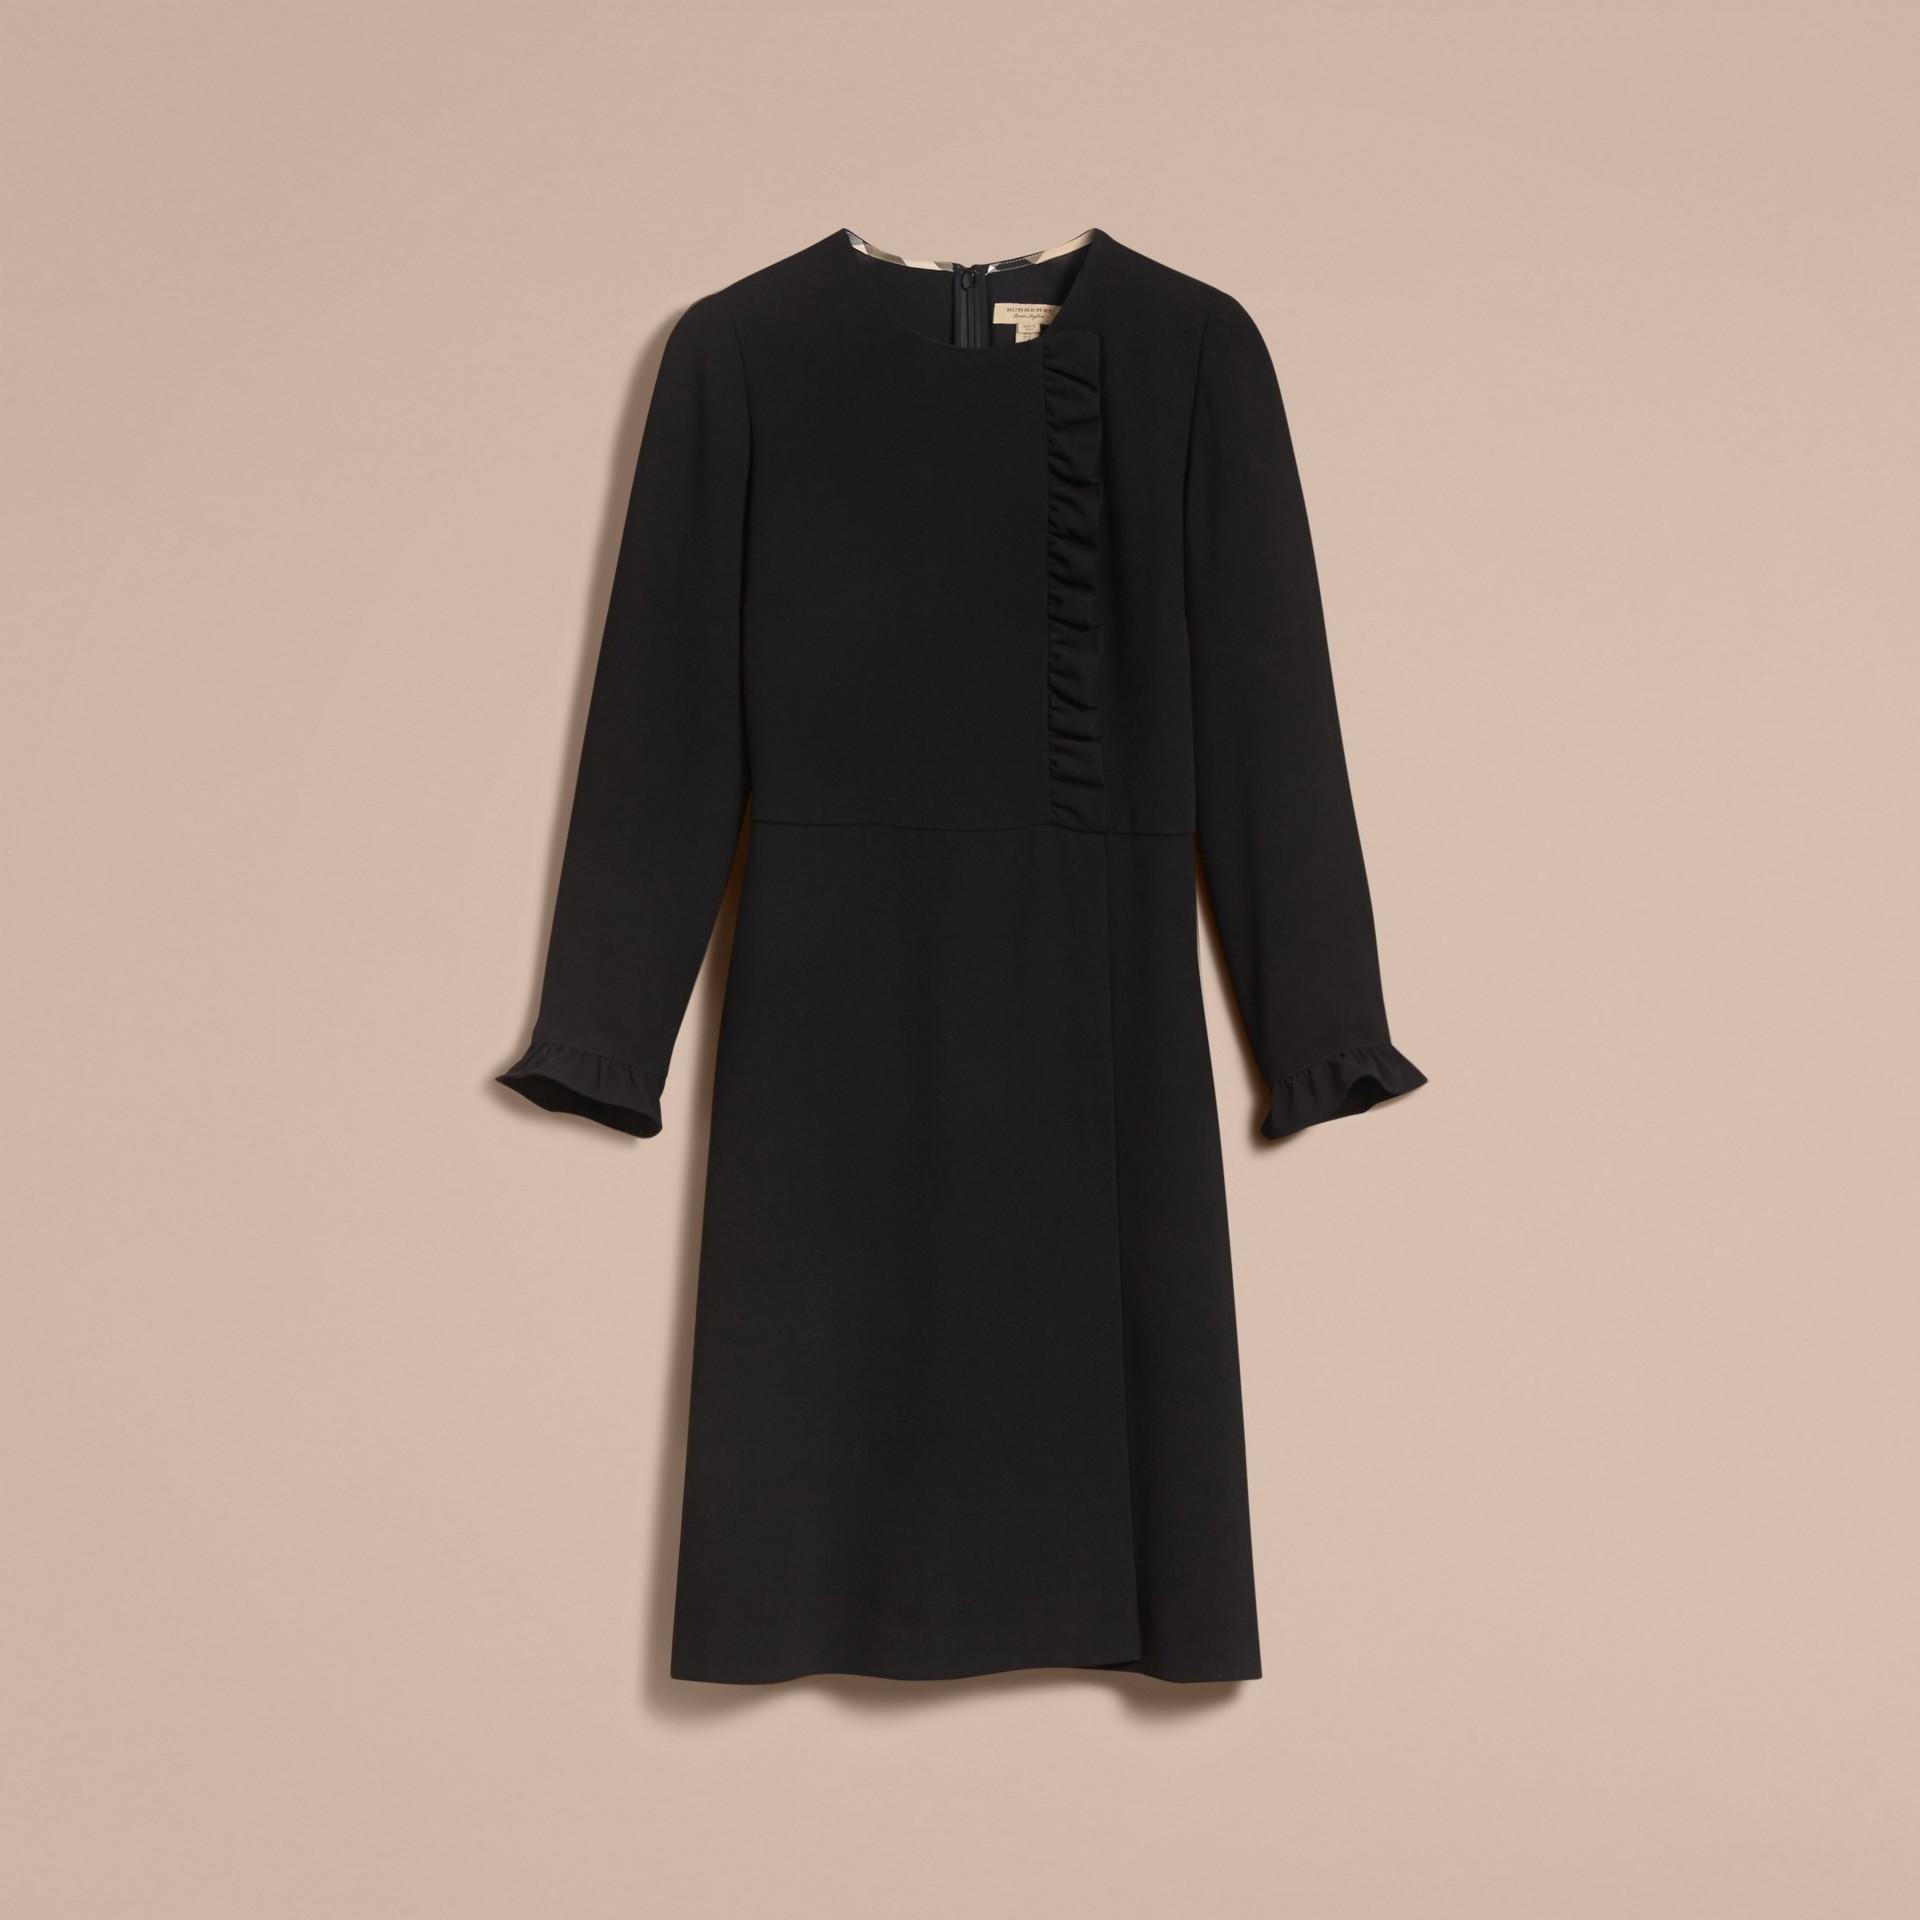 Ruffle Trim Crepe Dress - gallery image 4